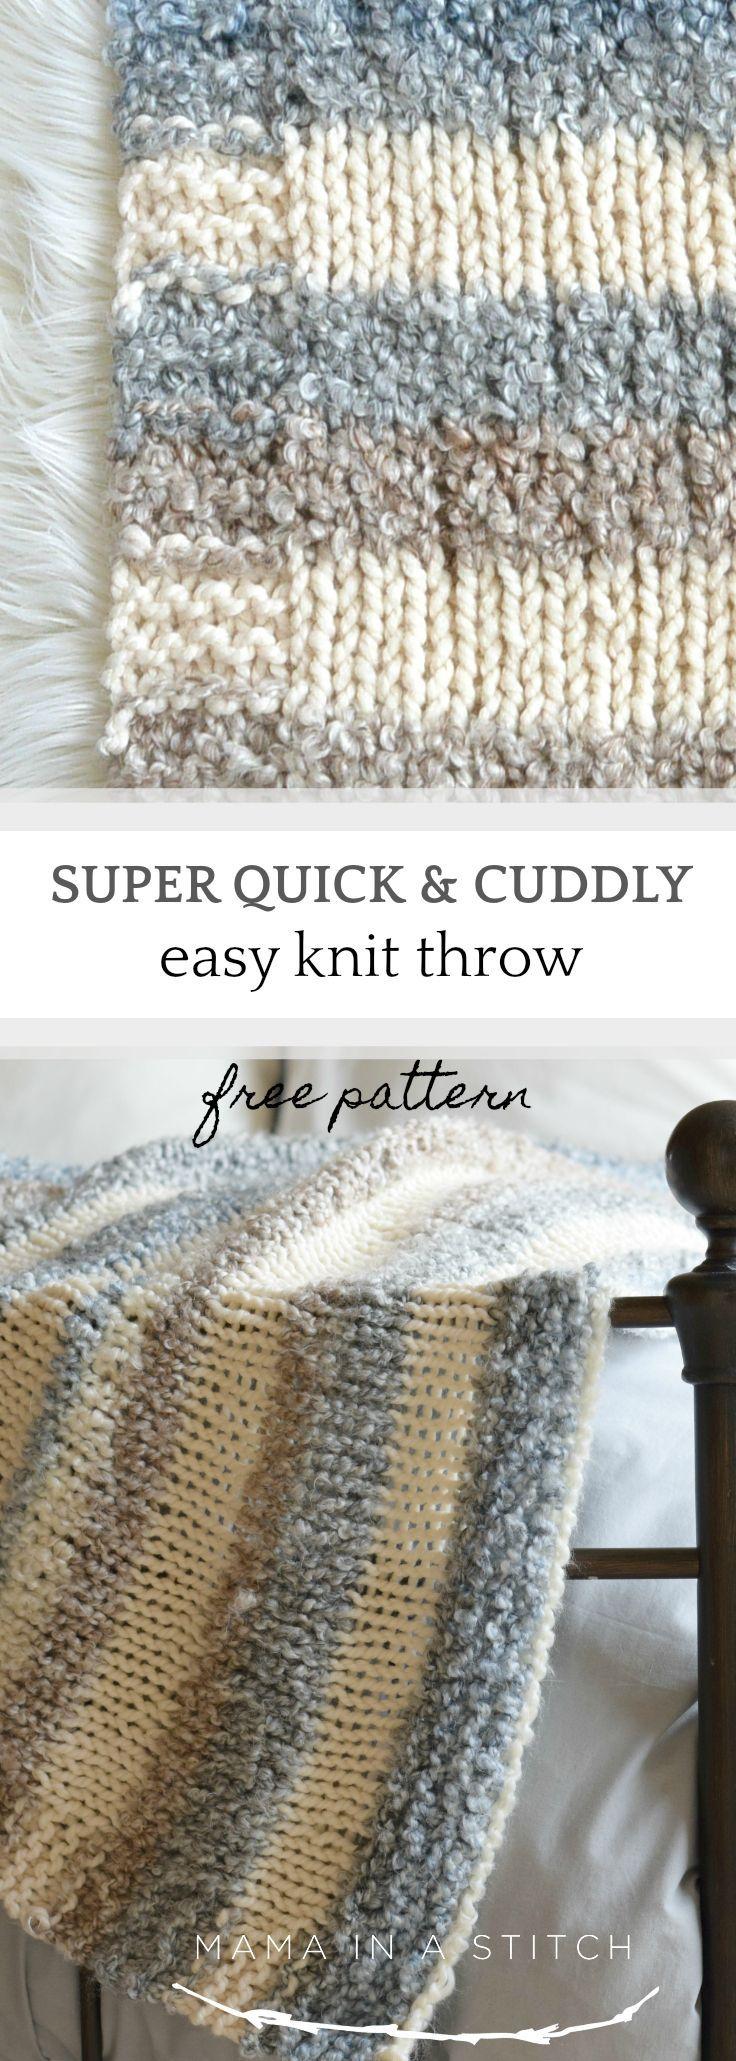 Cuddly Quick Knit Throw Blanket Pattern | Knitting patterns, Super ...